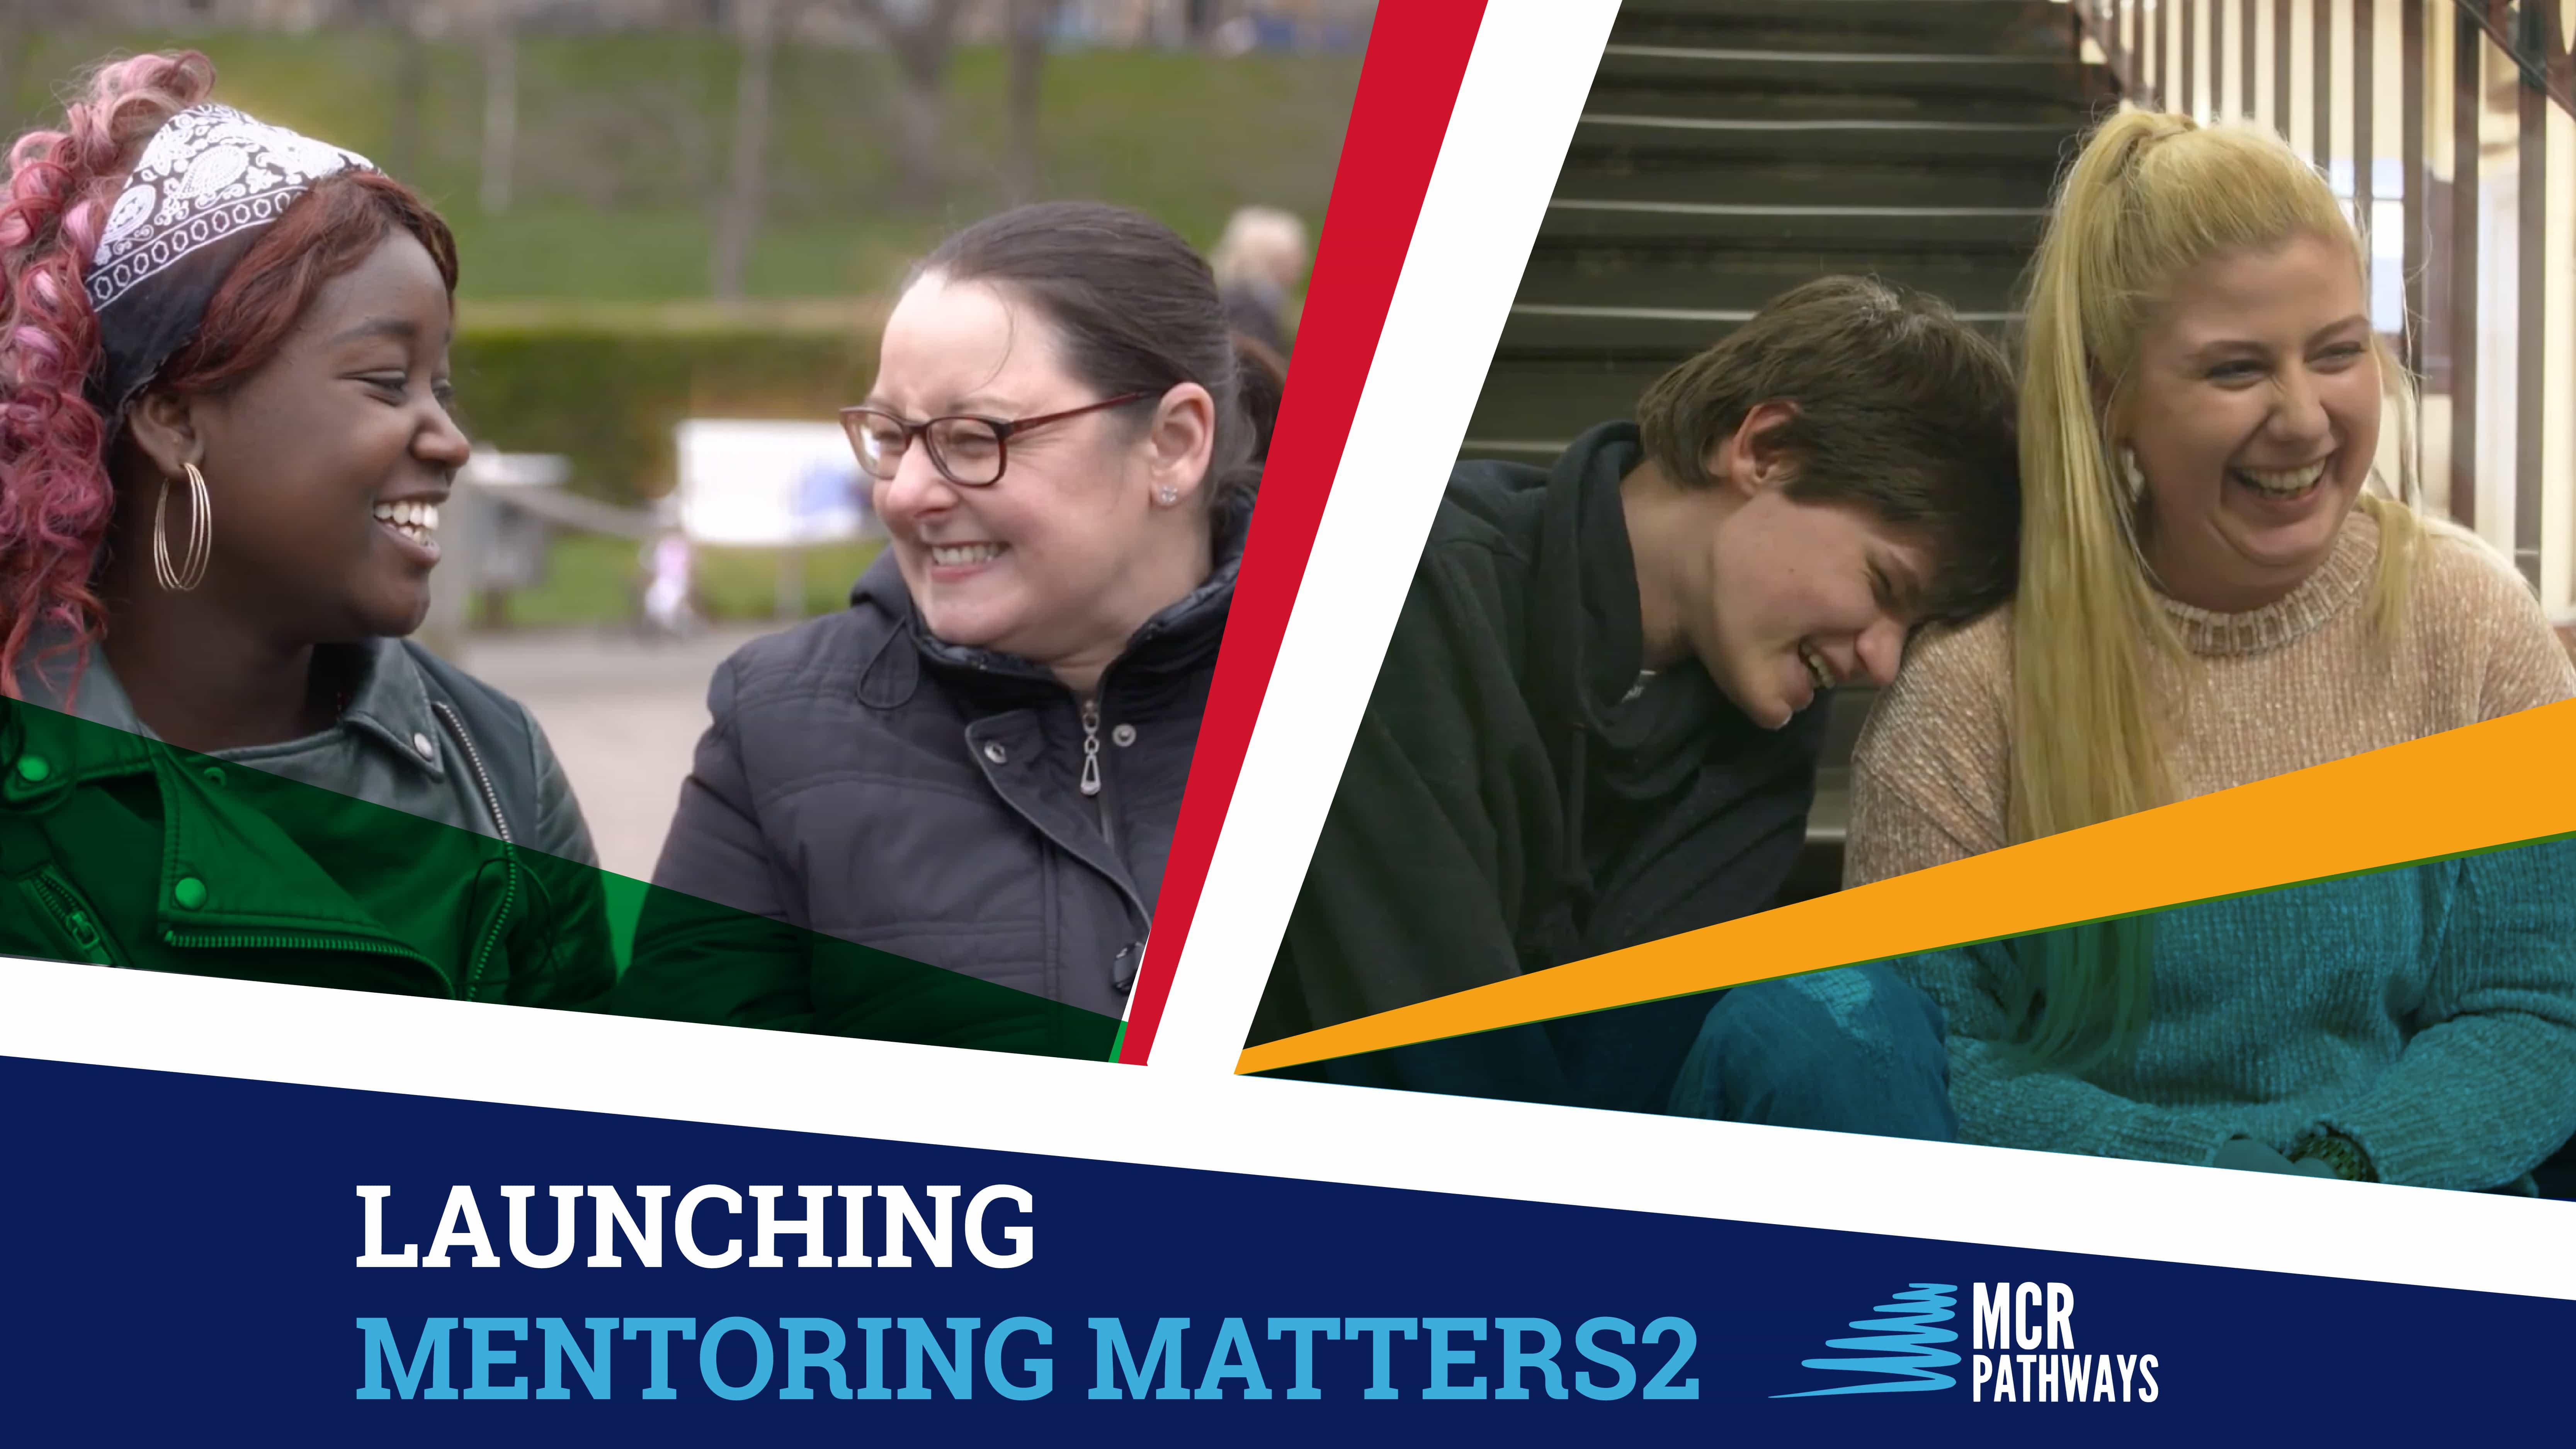 Launching Mentoring Matters 2